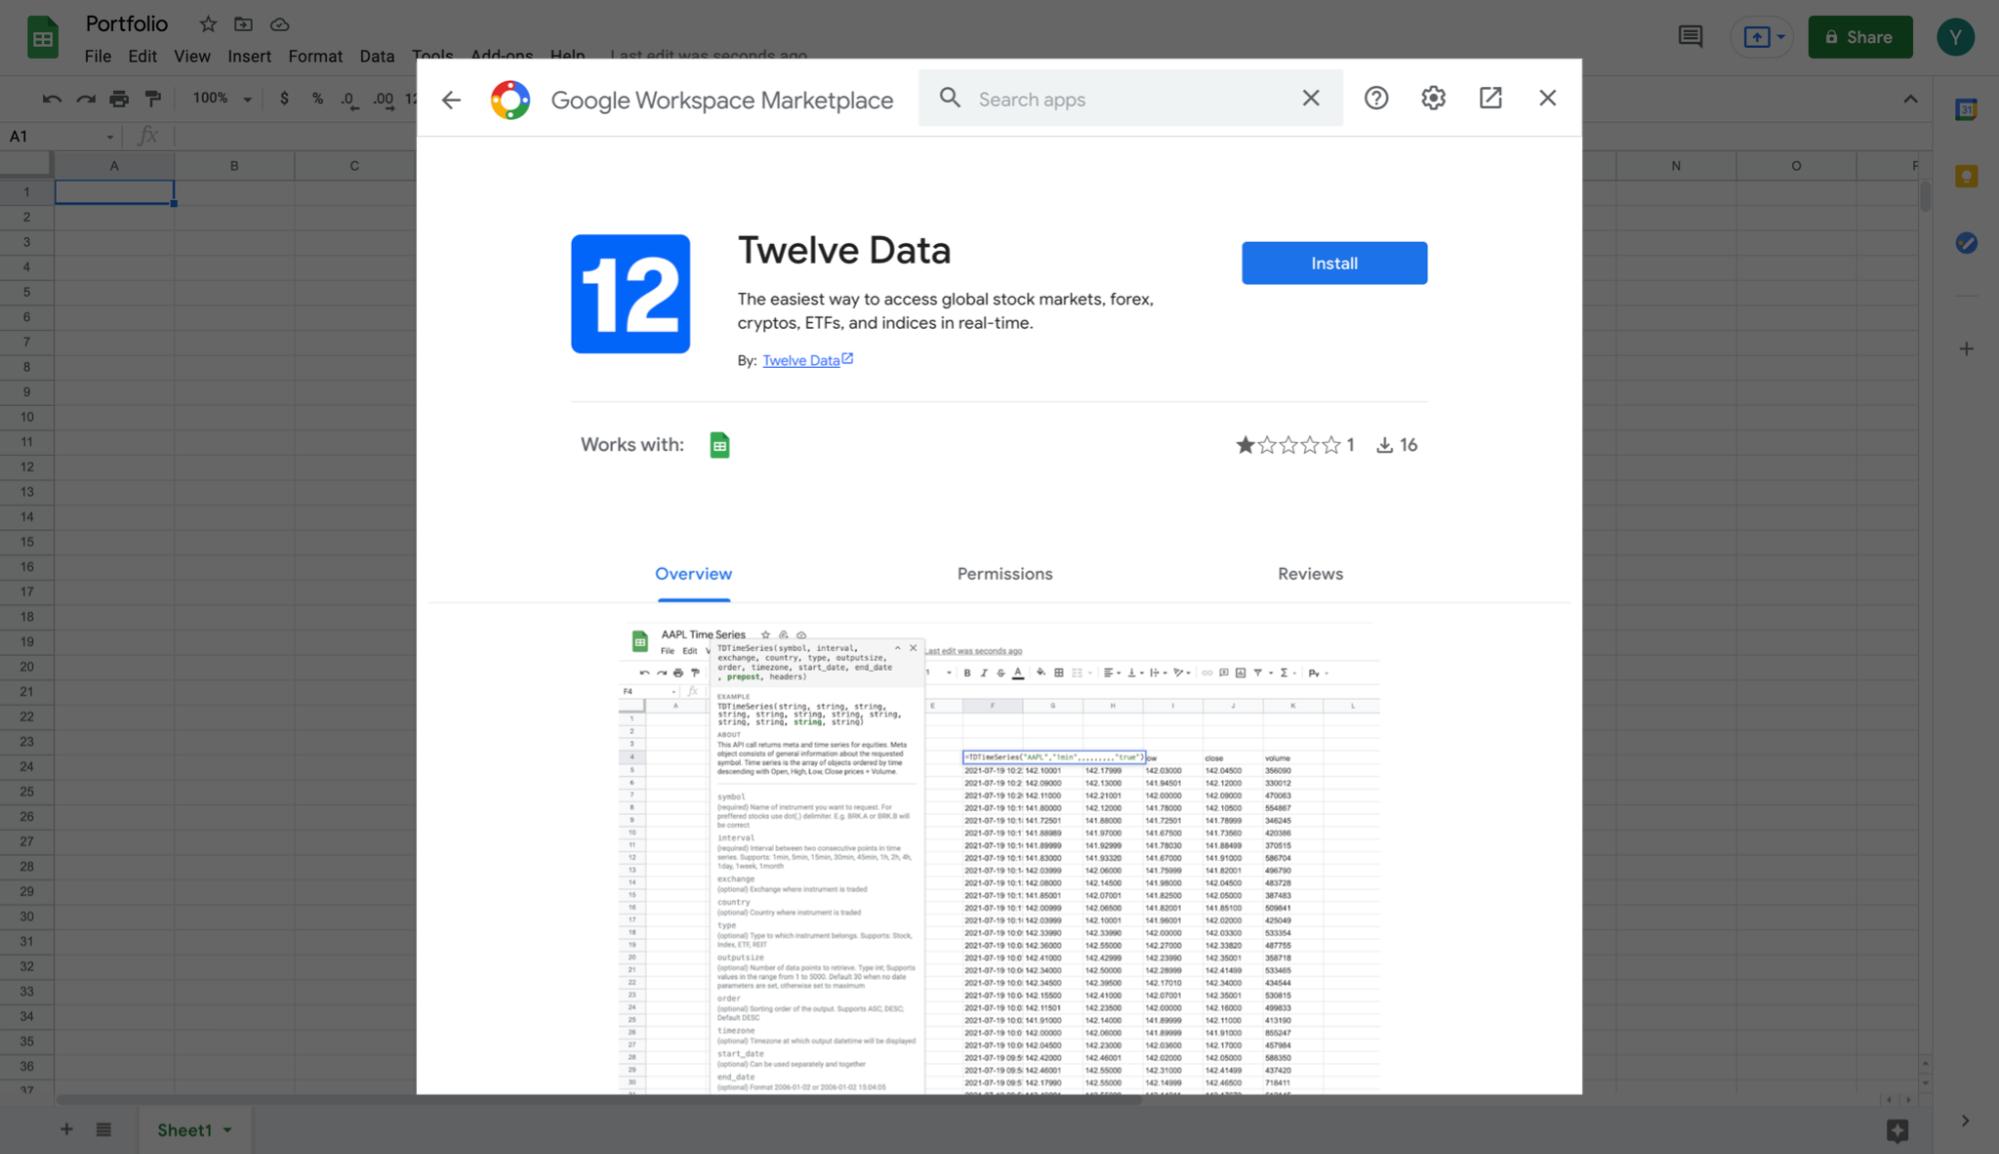 Google Workspace Marketplace Twelve Data Add-on page